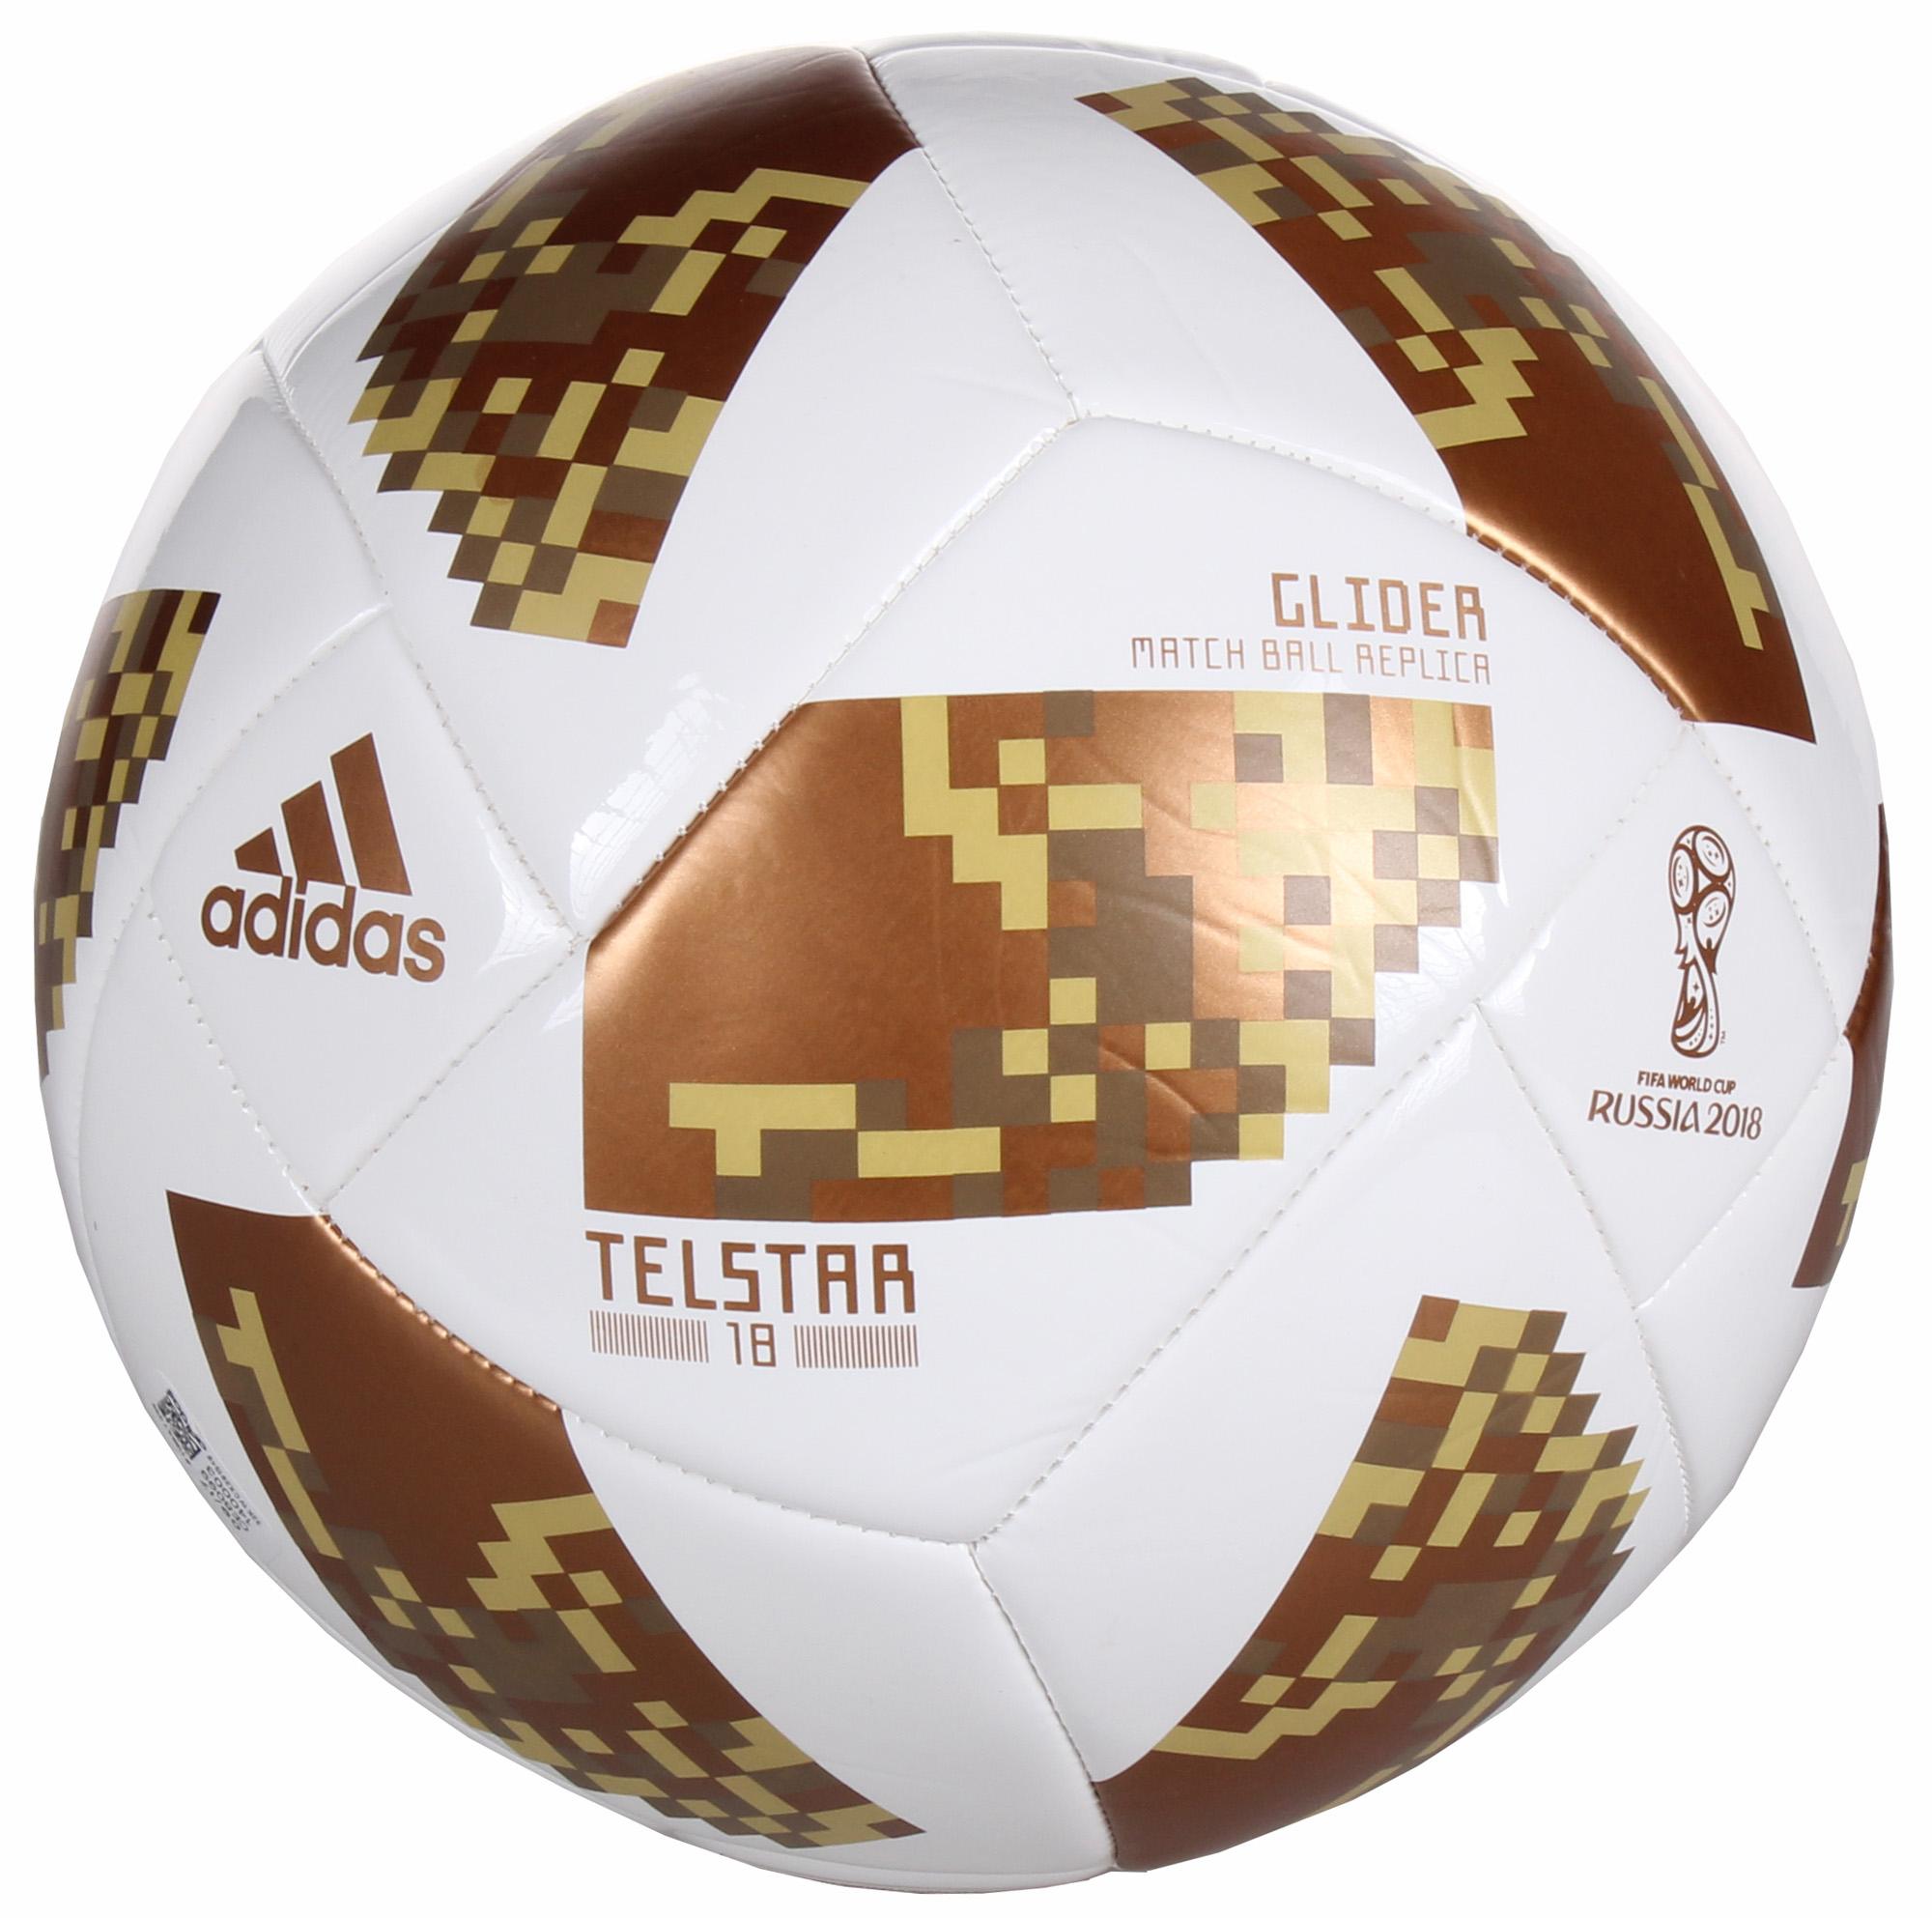 World Cup 2018 Glider futbalová lopta